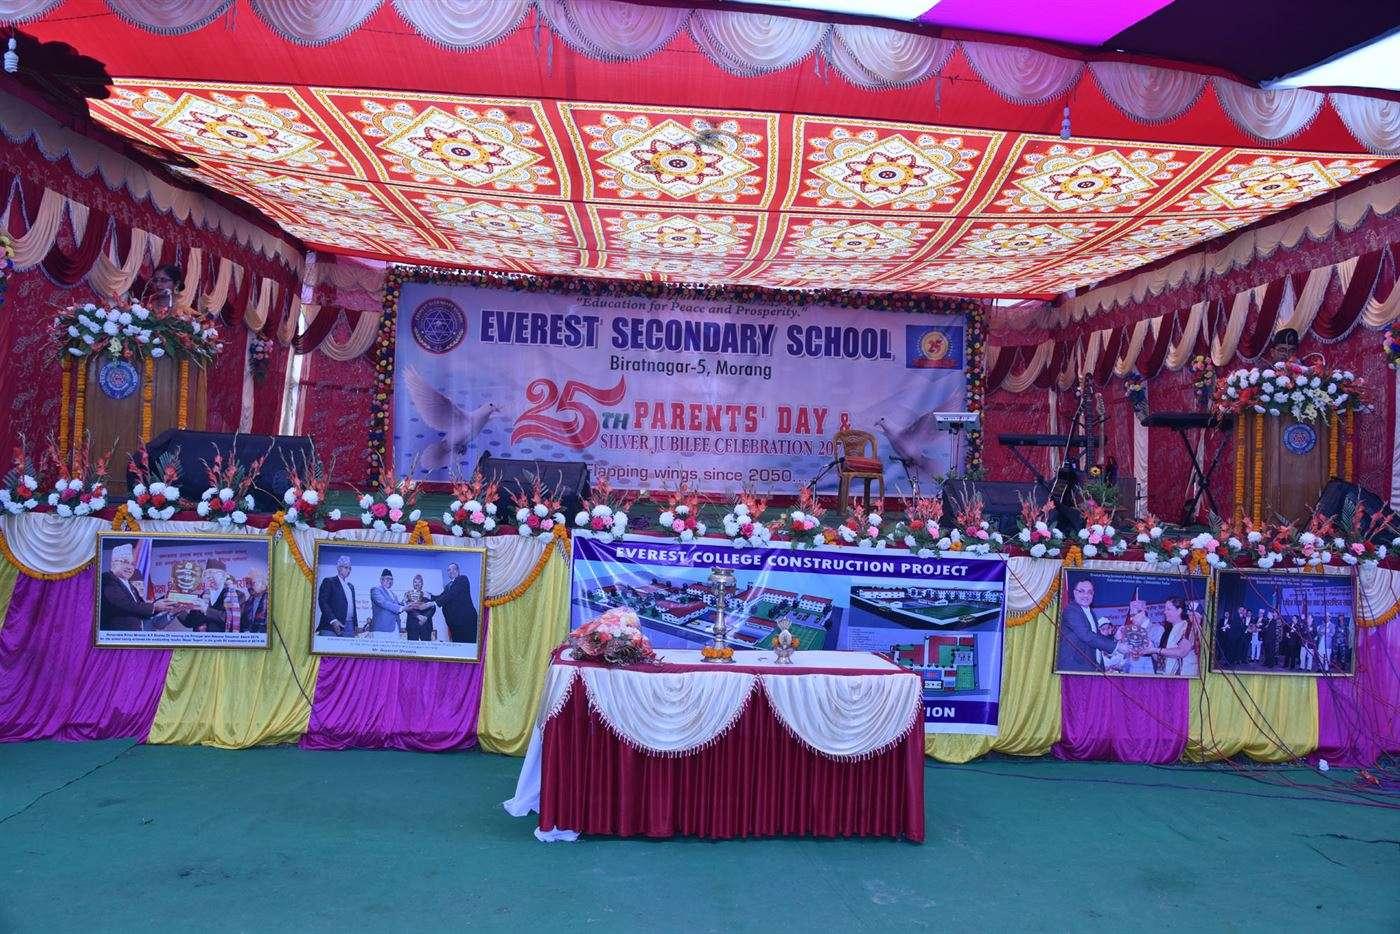 Everest Secondary School